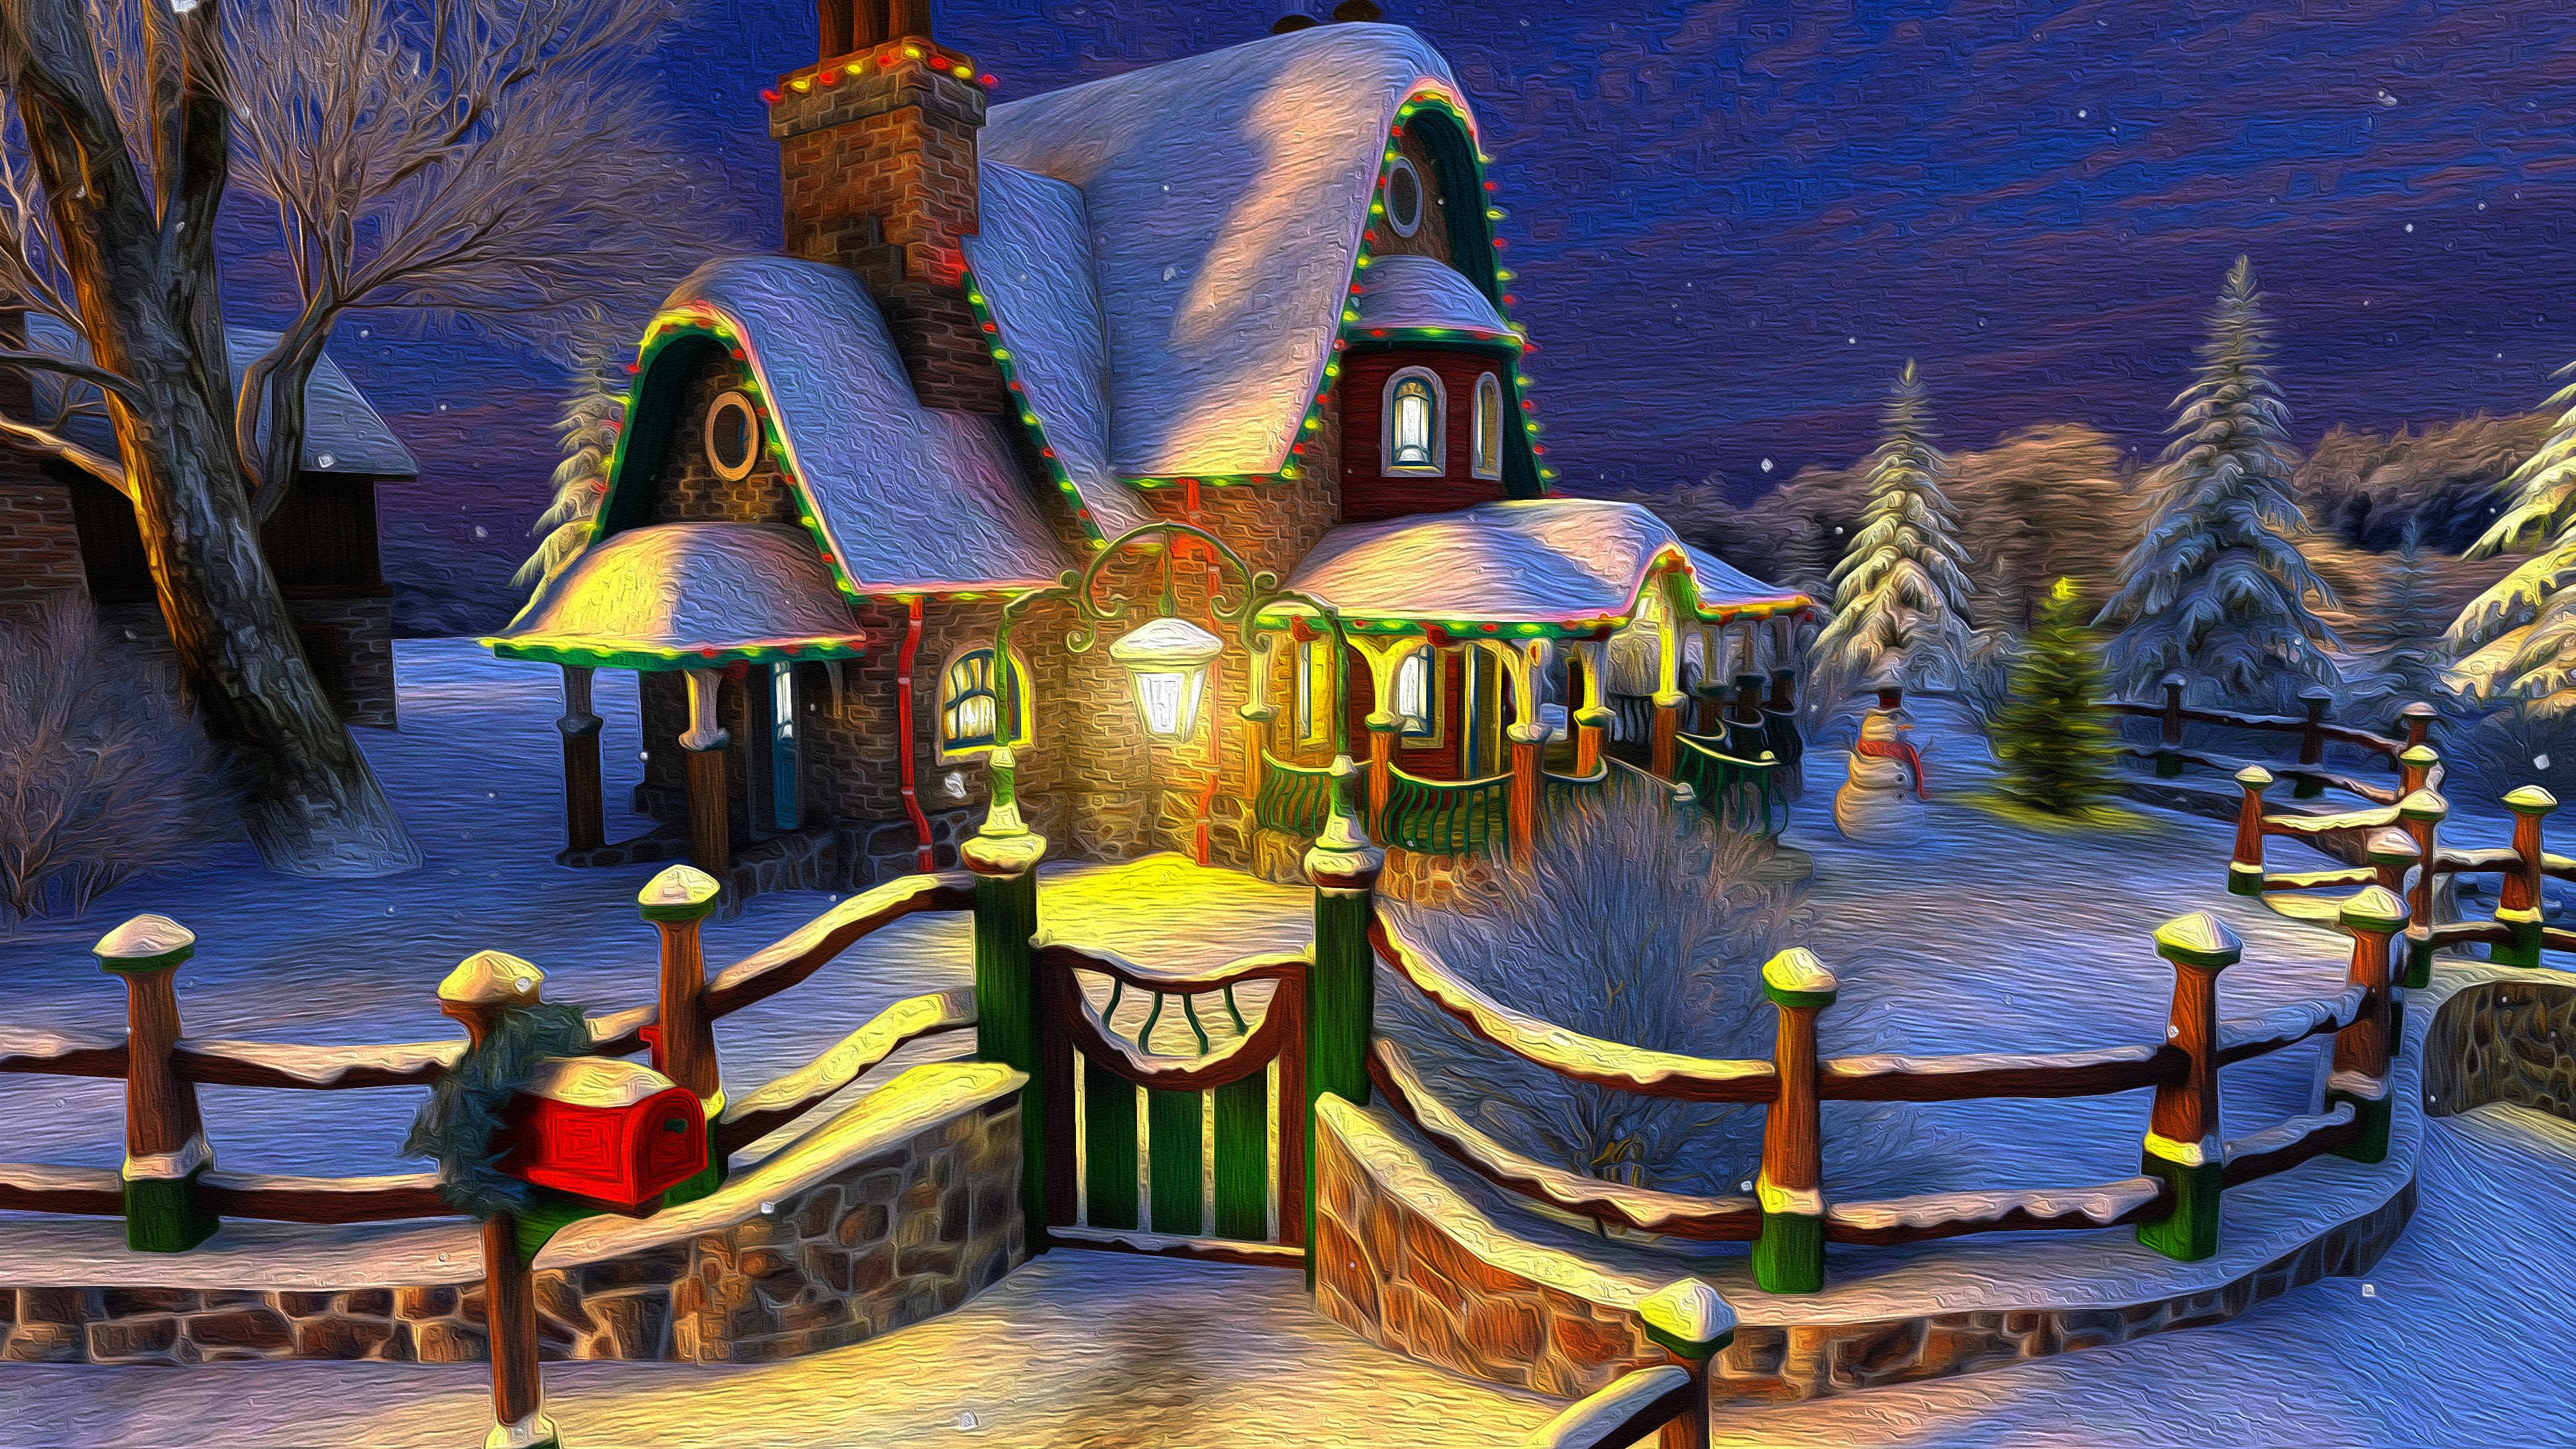 Christmas Holiday Light Oil Painting 3840x2160